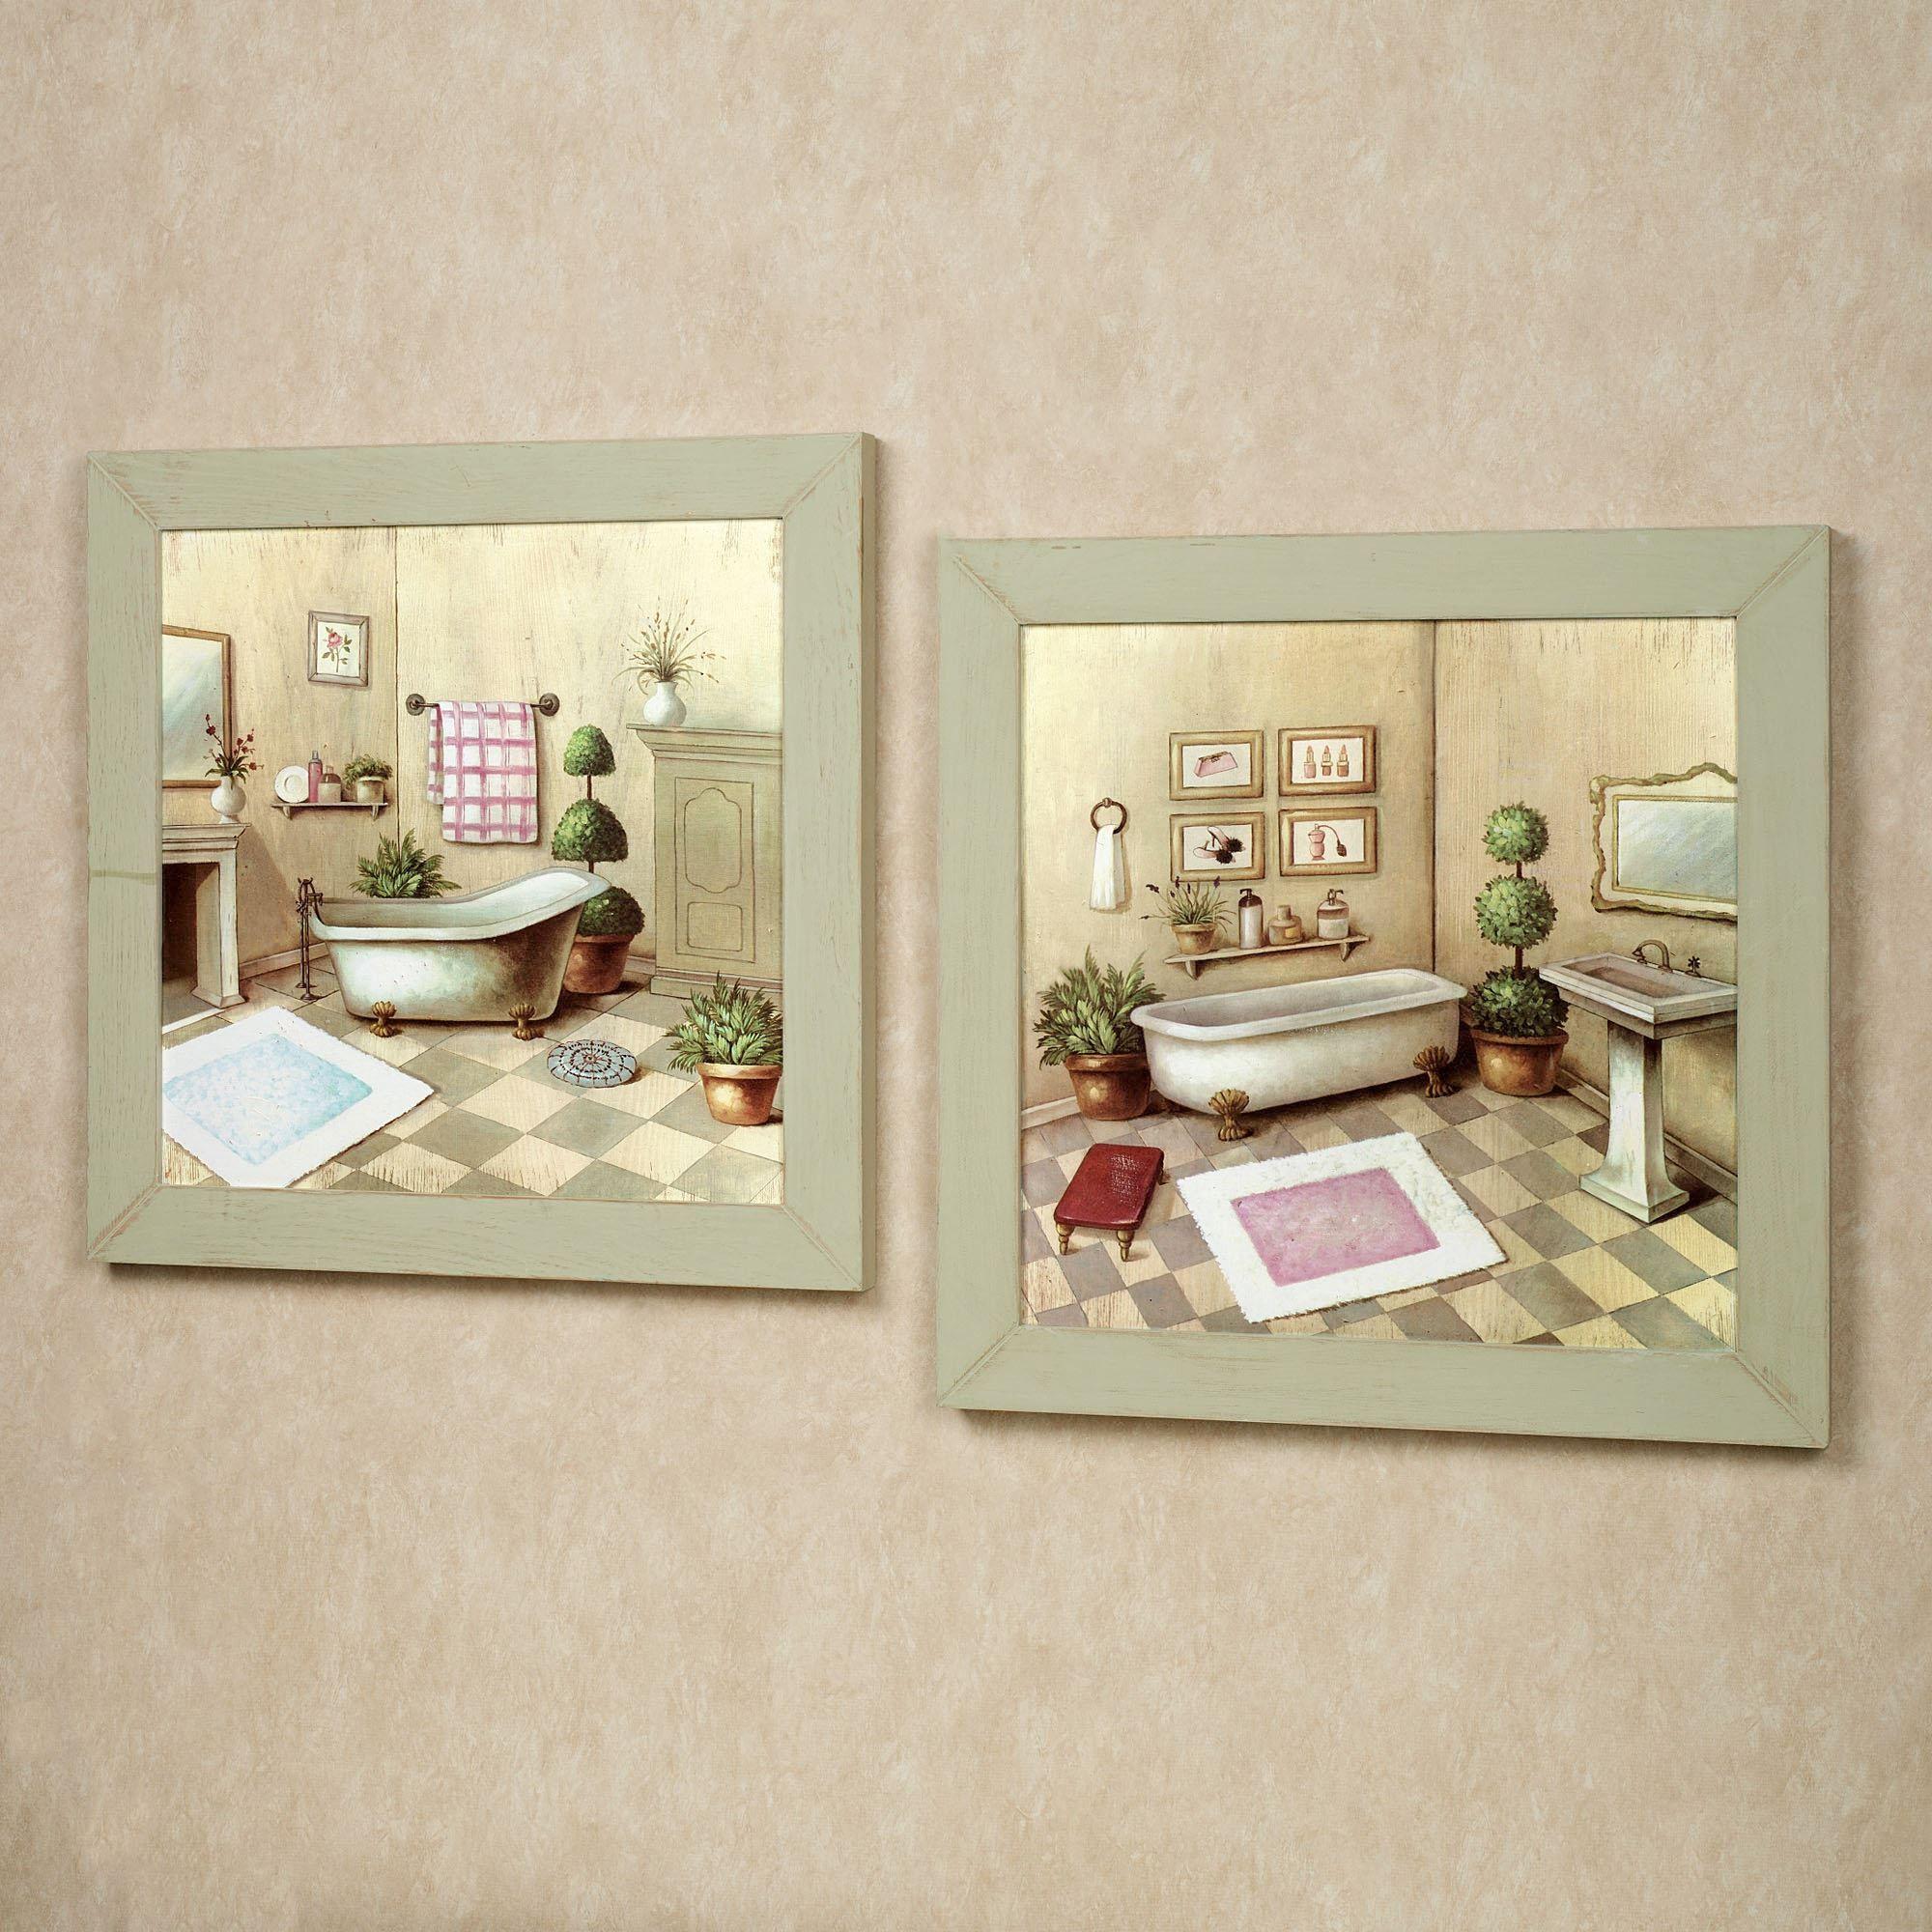 13 Creative Ideas Bathroom Walls Shelf That Will Make Your Bathroom Stunning Funny Bathroom Decor Bathroom Wall Art Wall Accessories